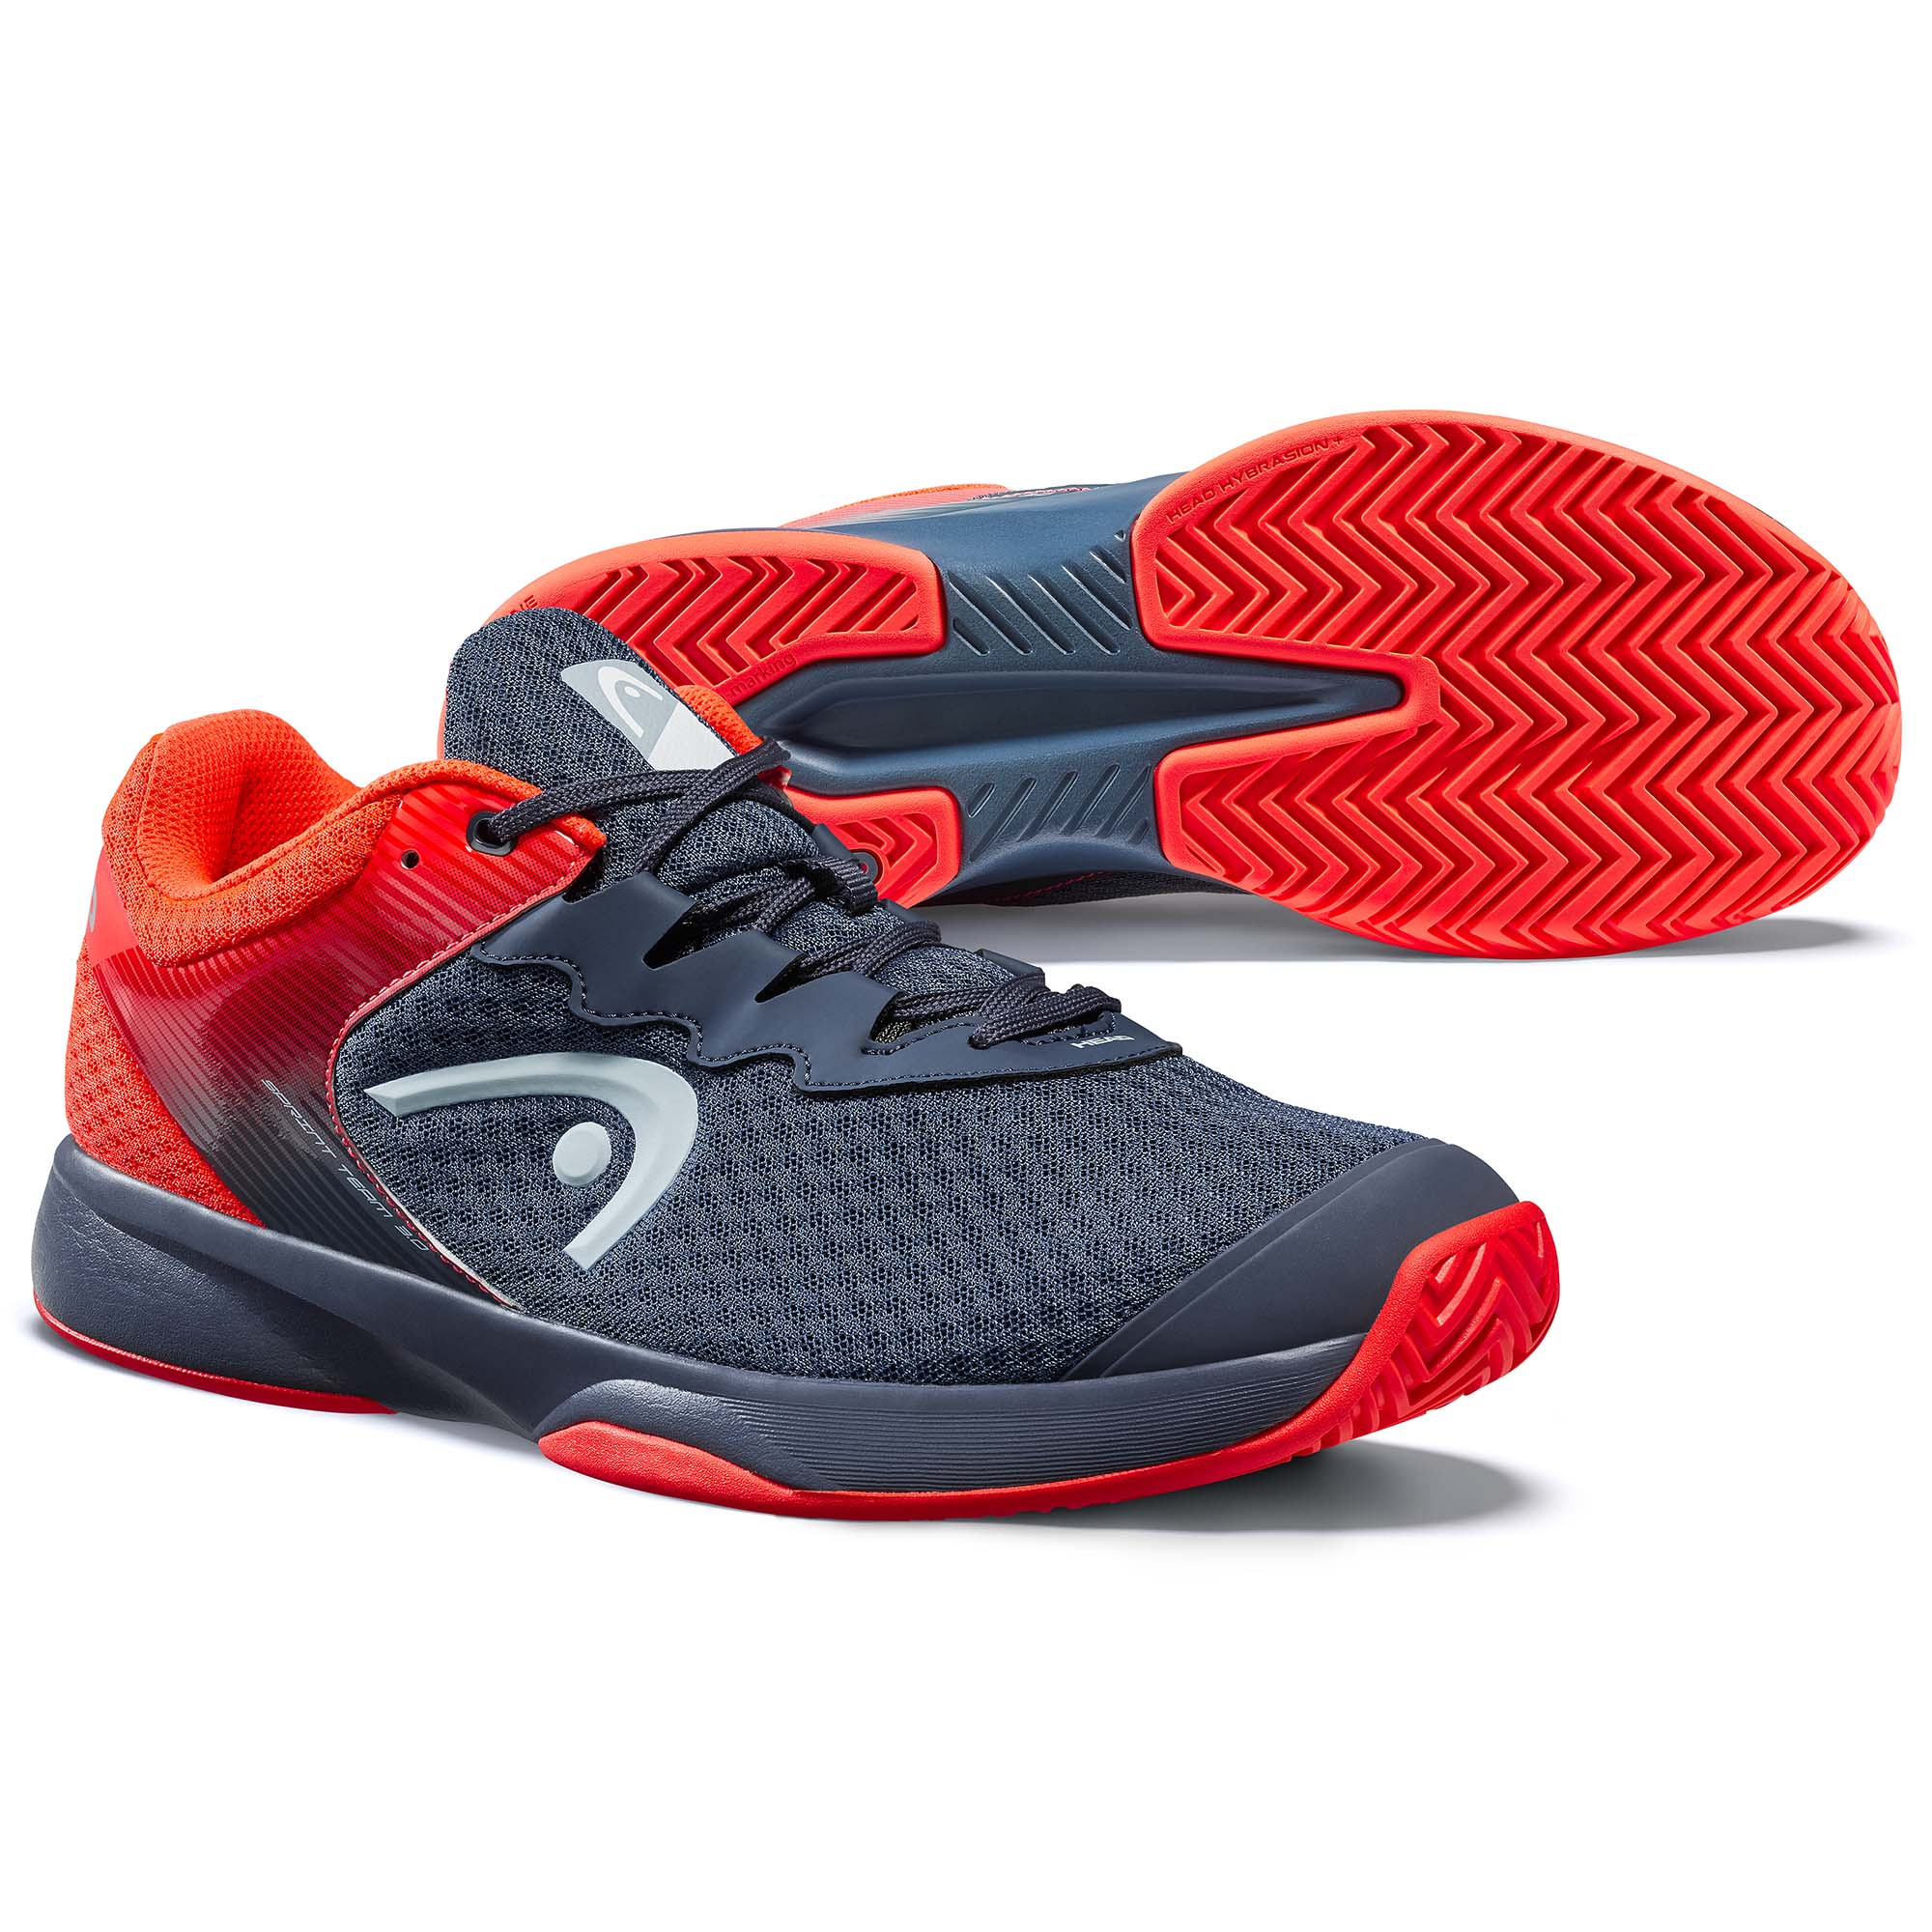 Head Sprint Team 3.0 Mens Tennis Shoes - 8 UK